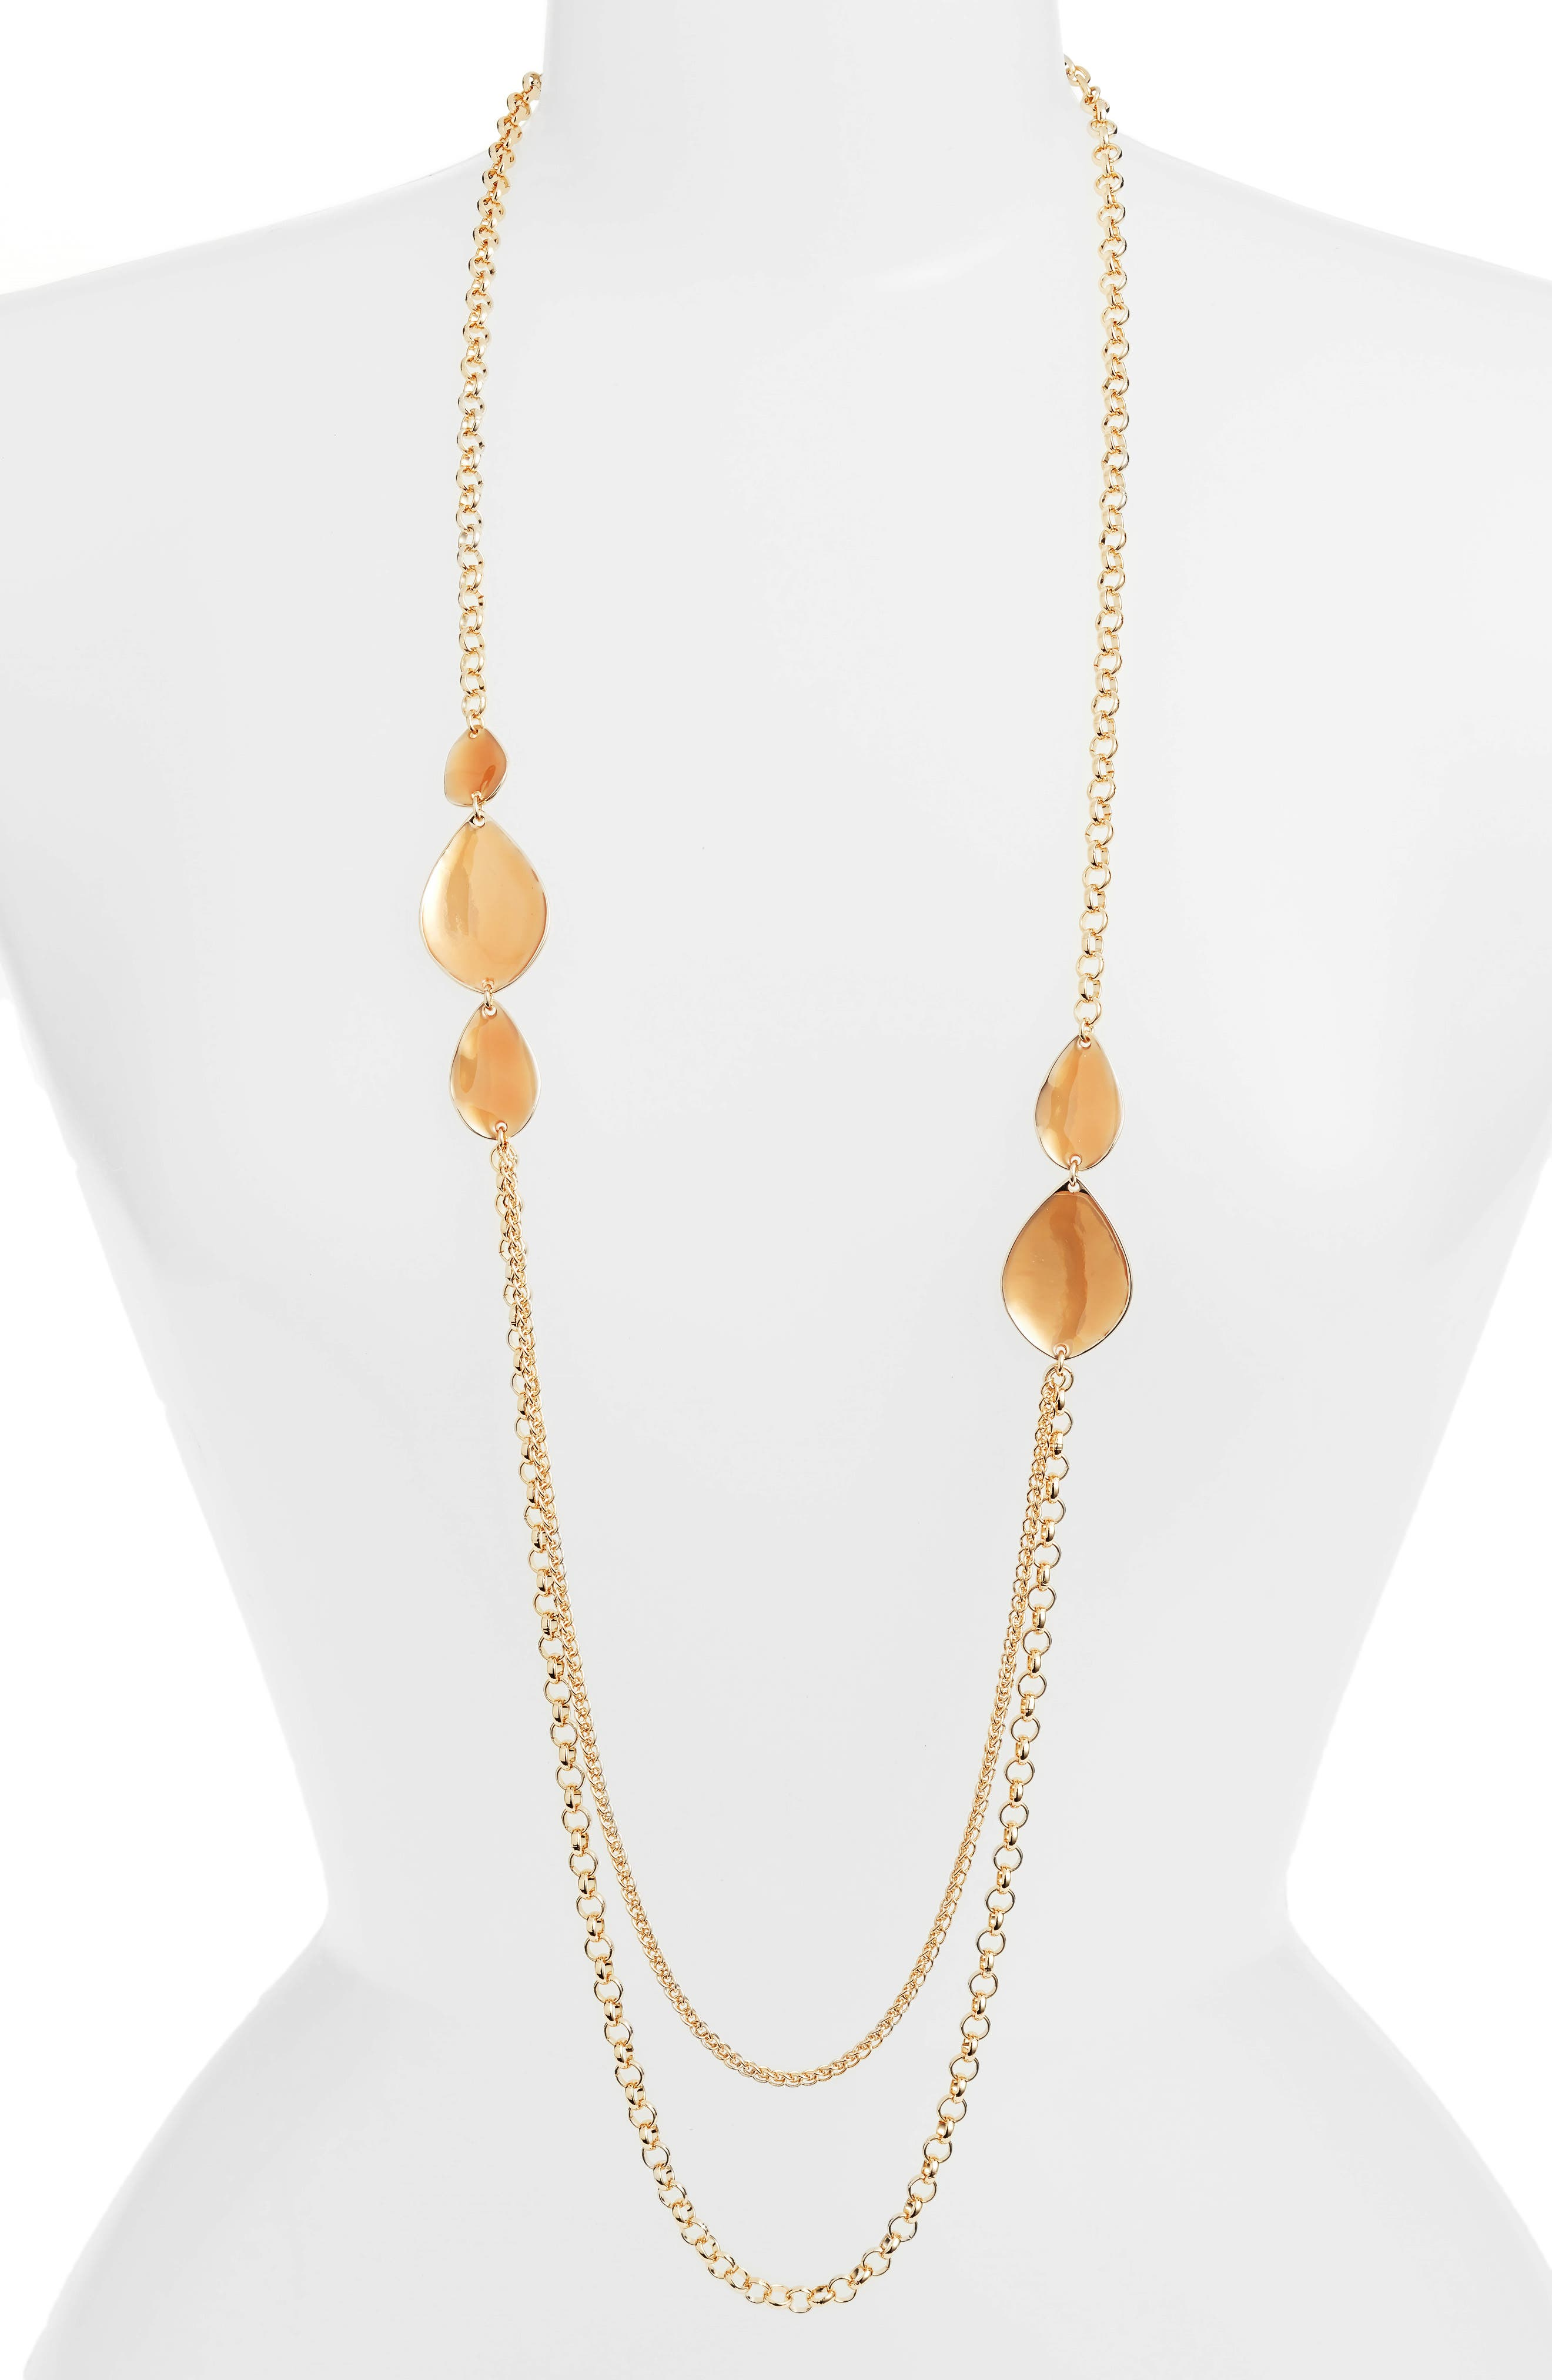 Painted Petal Draped Long Necklace,                         Main,                         color, Blush- Gold